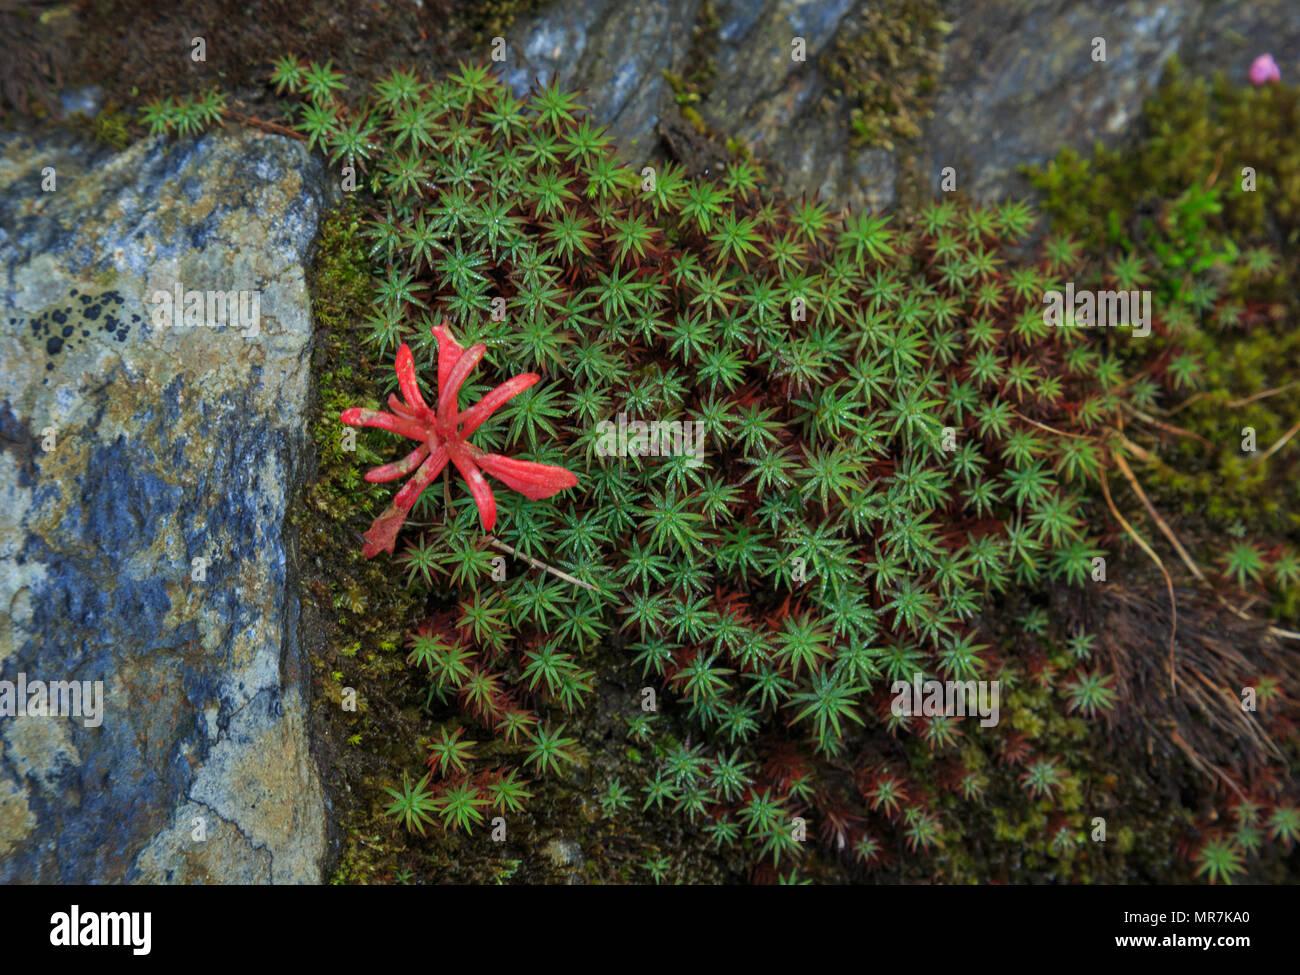 Moss growing on the wet rock - on the way to Jalori Pass (Himachal Pradesh, India) - Stock Image